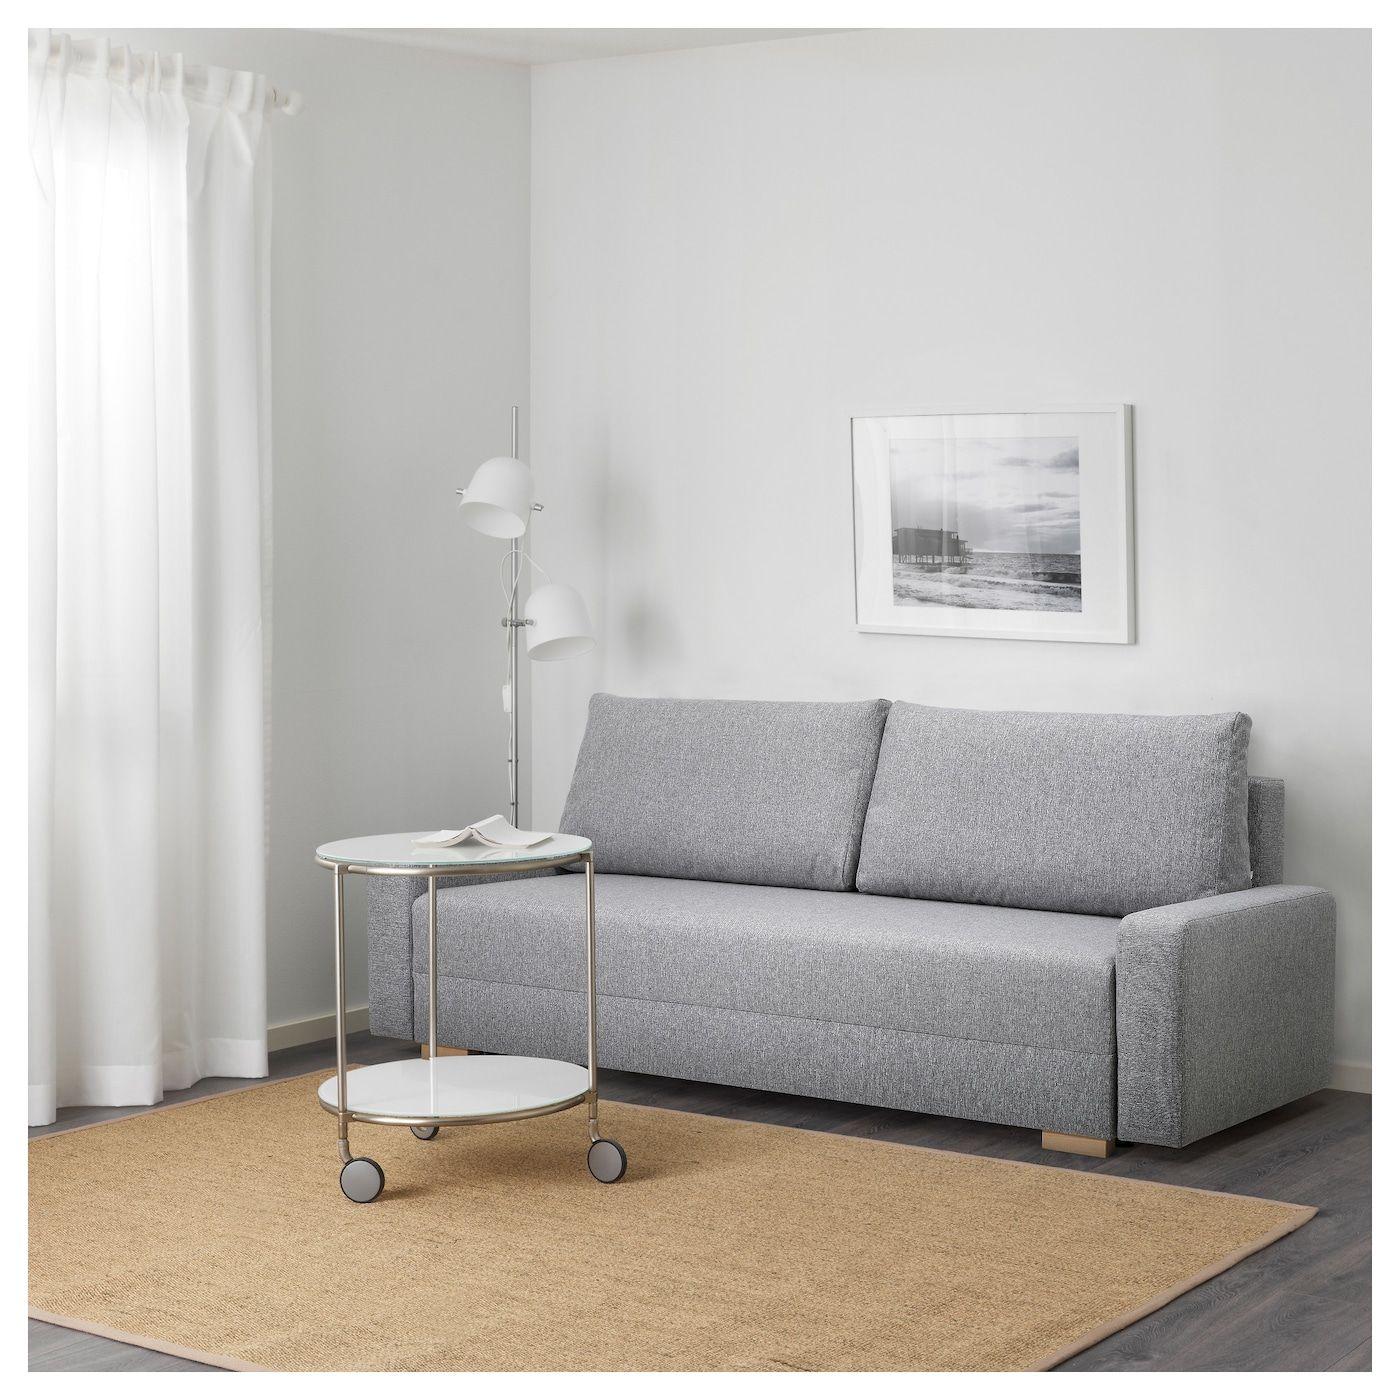 Grälviken Rozkładana Sofa 3-Osobowa, Szary | Chata pour Gralviken